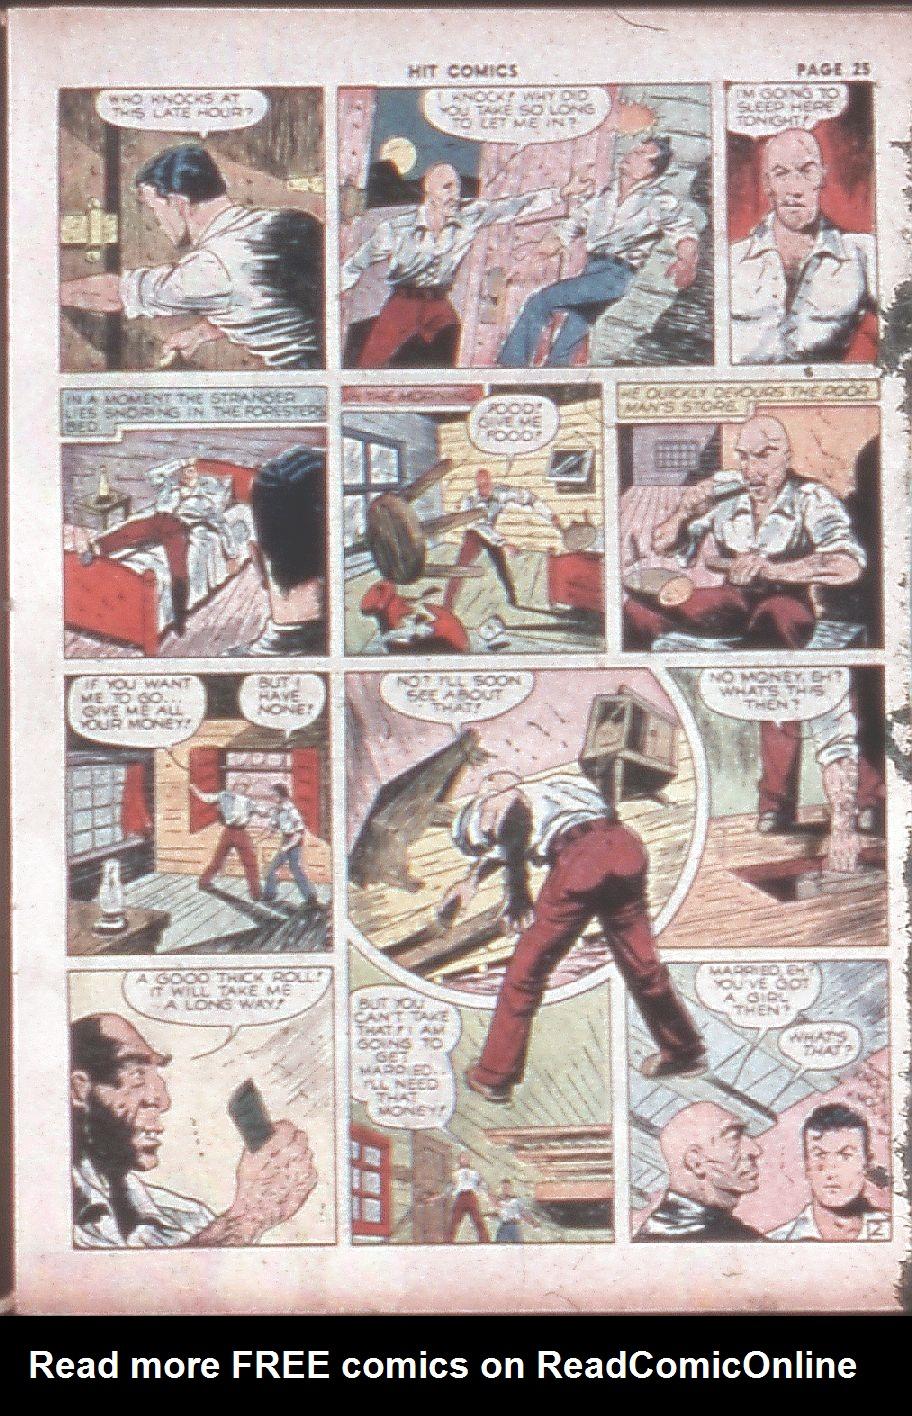 Read online Hit Comics comic -  Issue #8 - 27